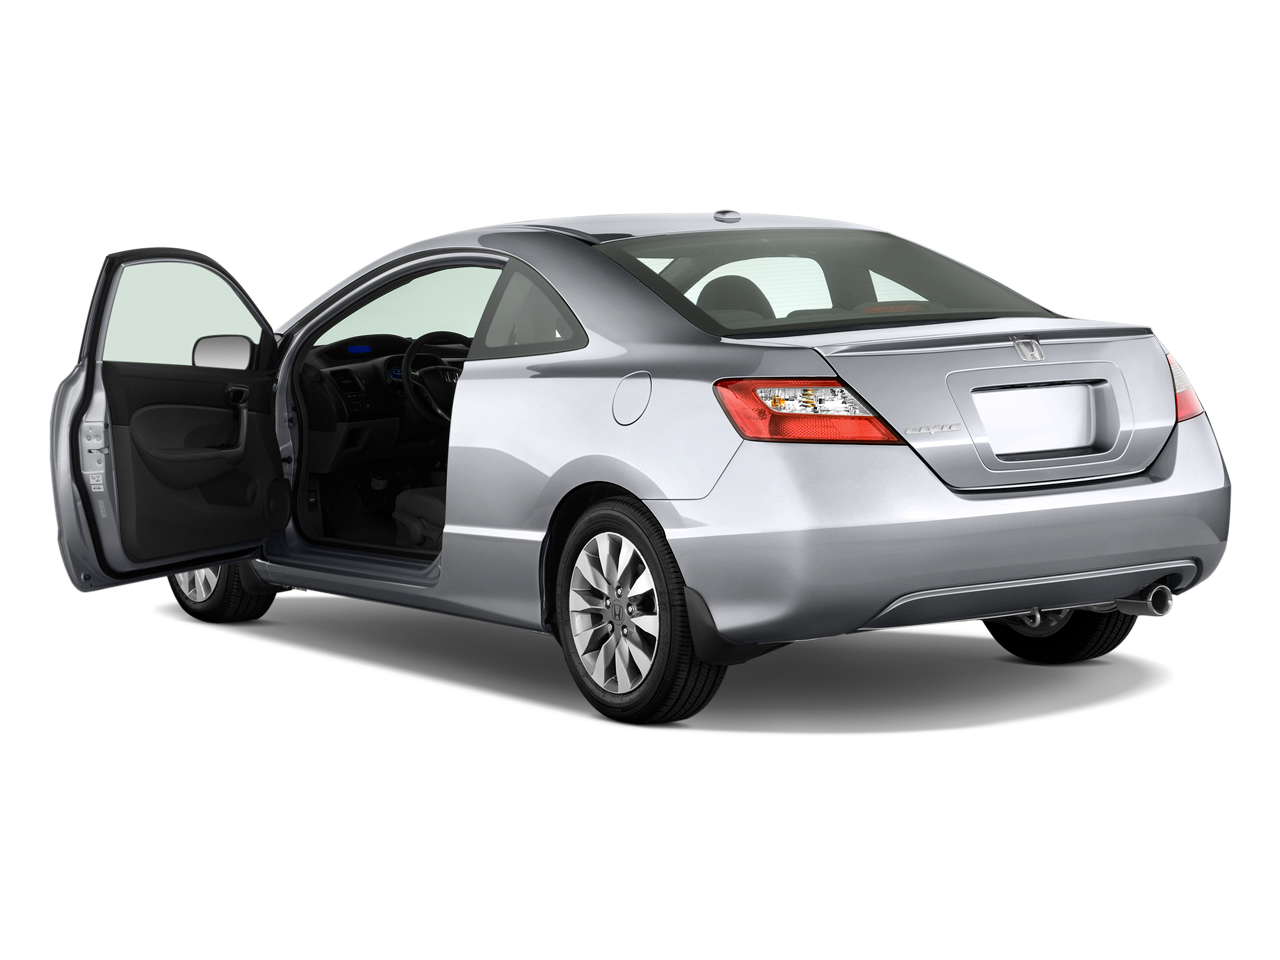 2009 honda civic si coupe honda sport coupe review automobile. Black Bedroom Furniture Sets. Home Design Ideas